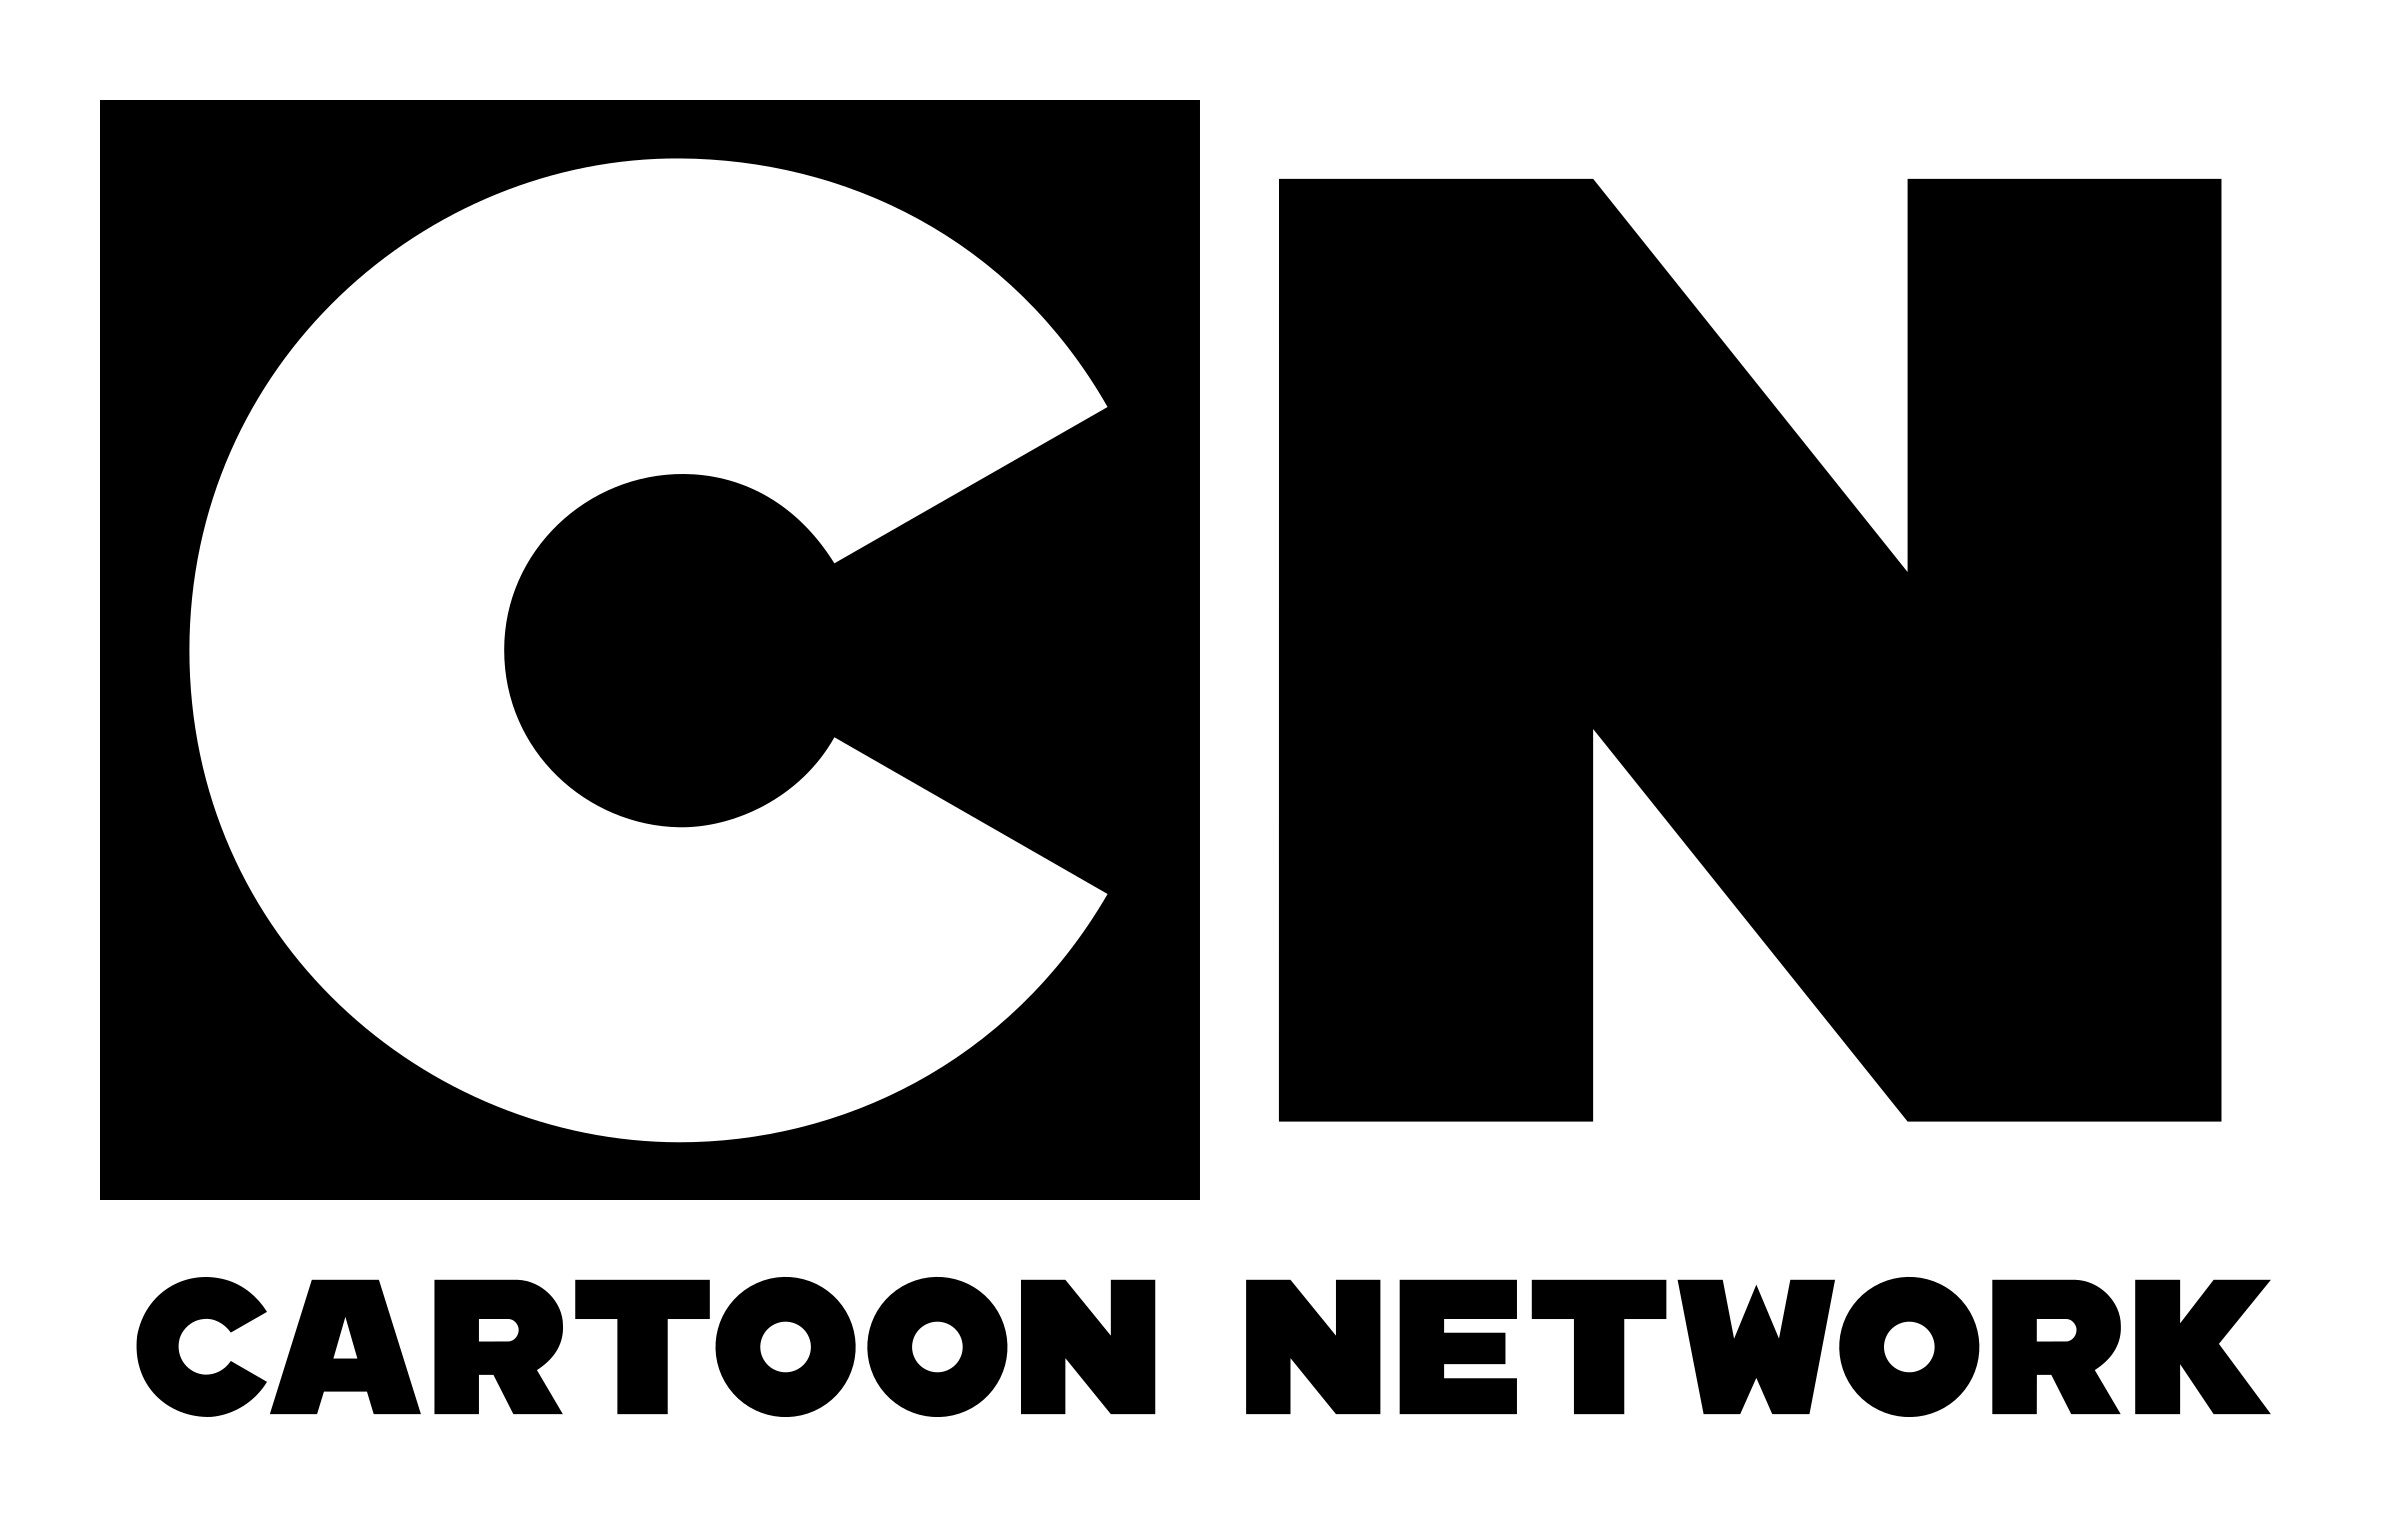 Network clipart vector png. Cartoon logo transparent svg